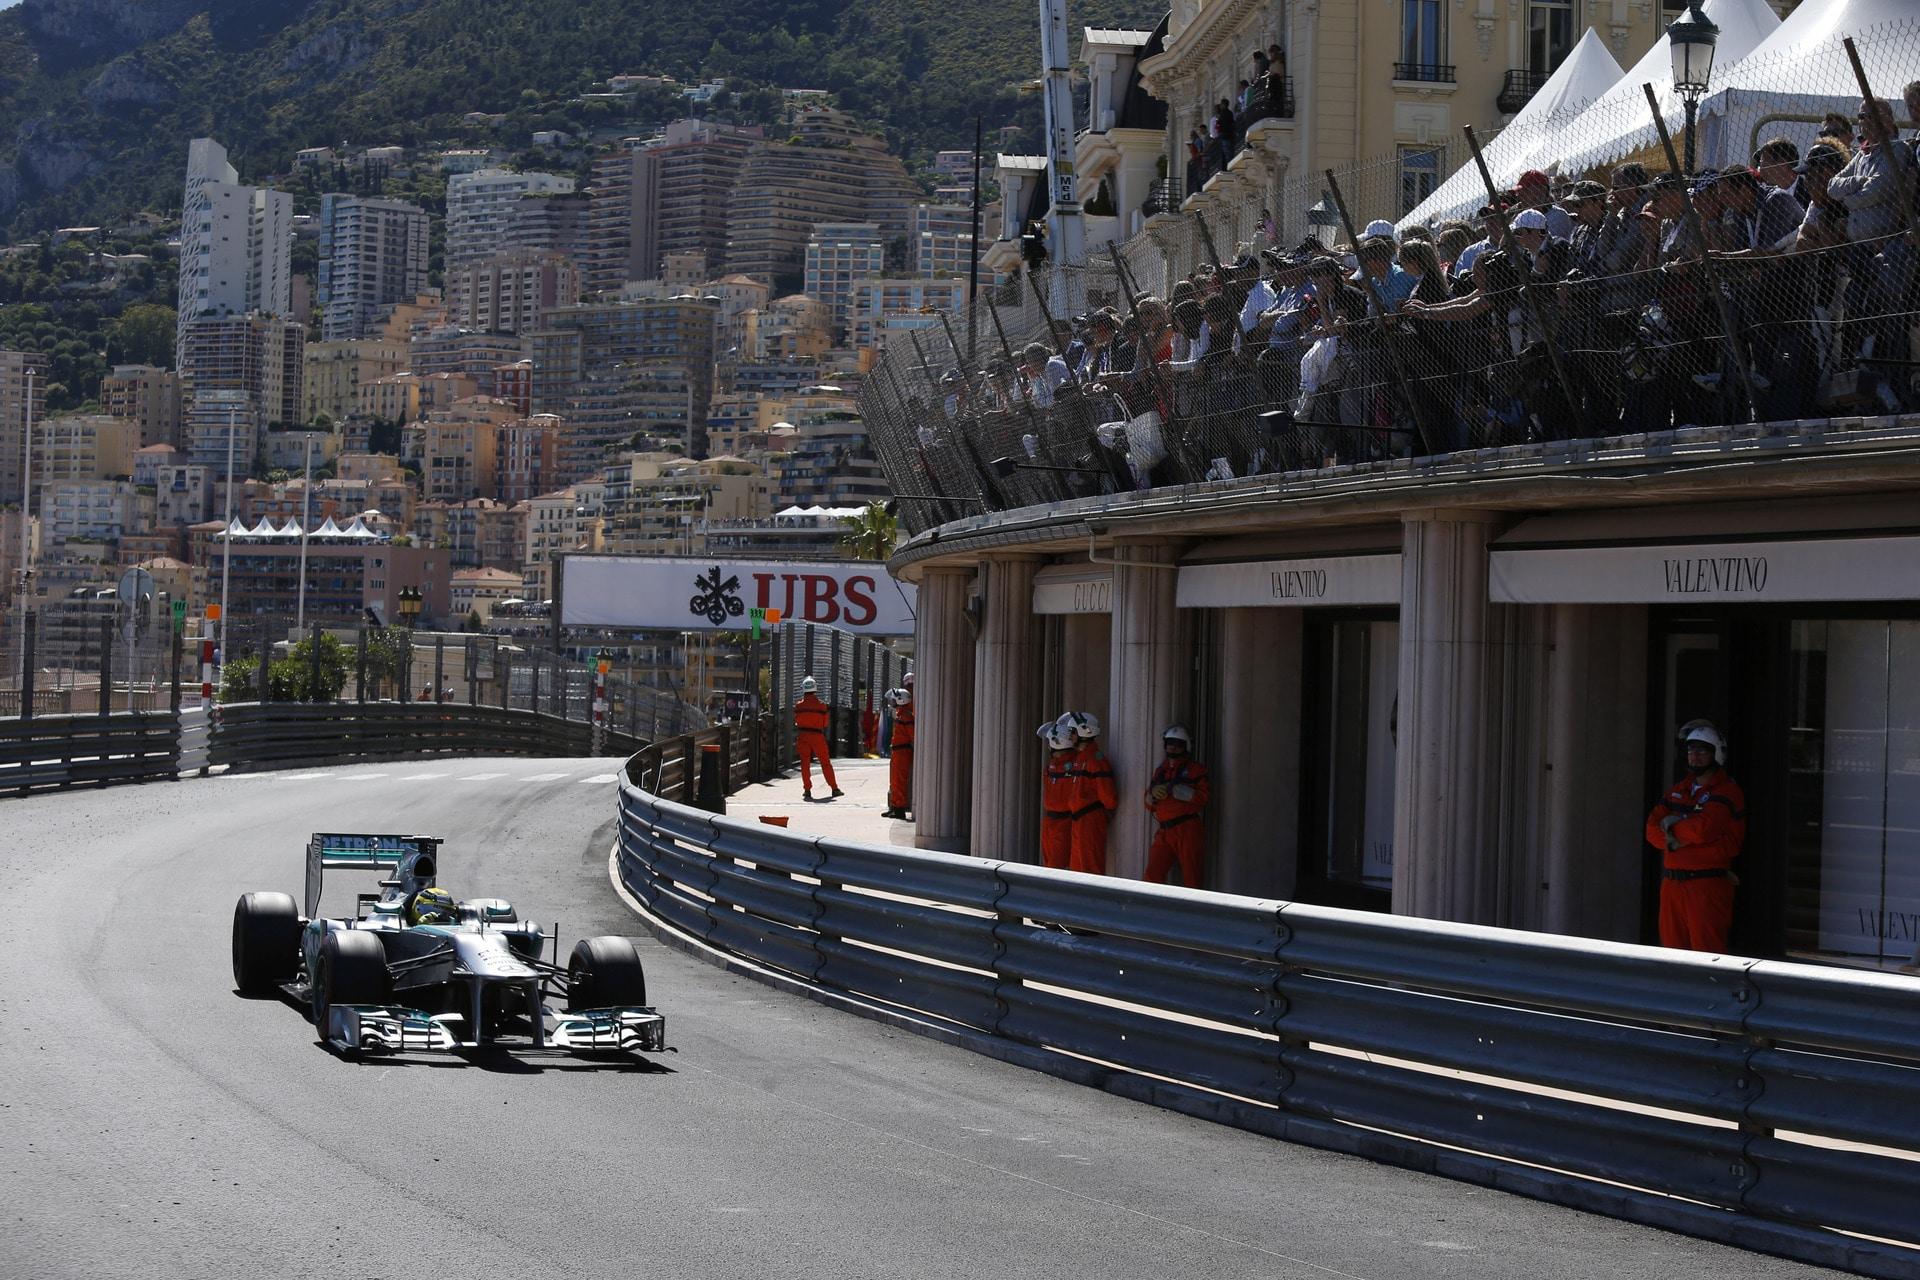 Where is Monaco located